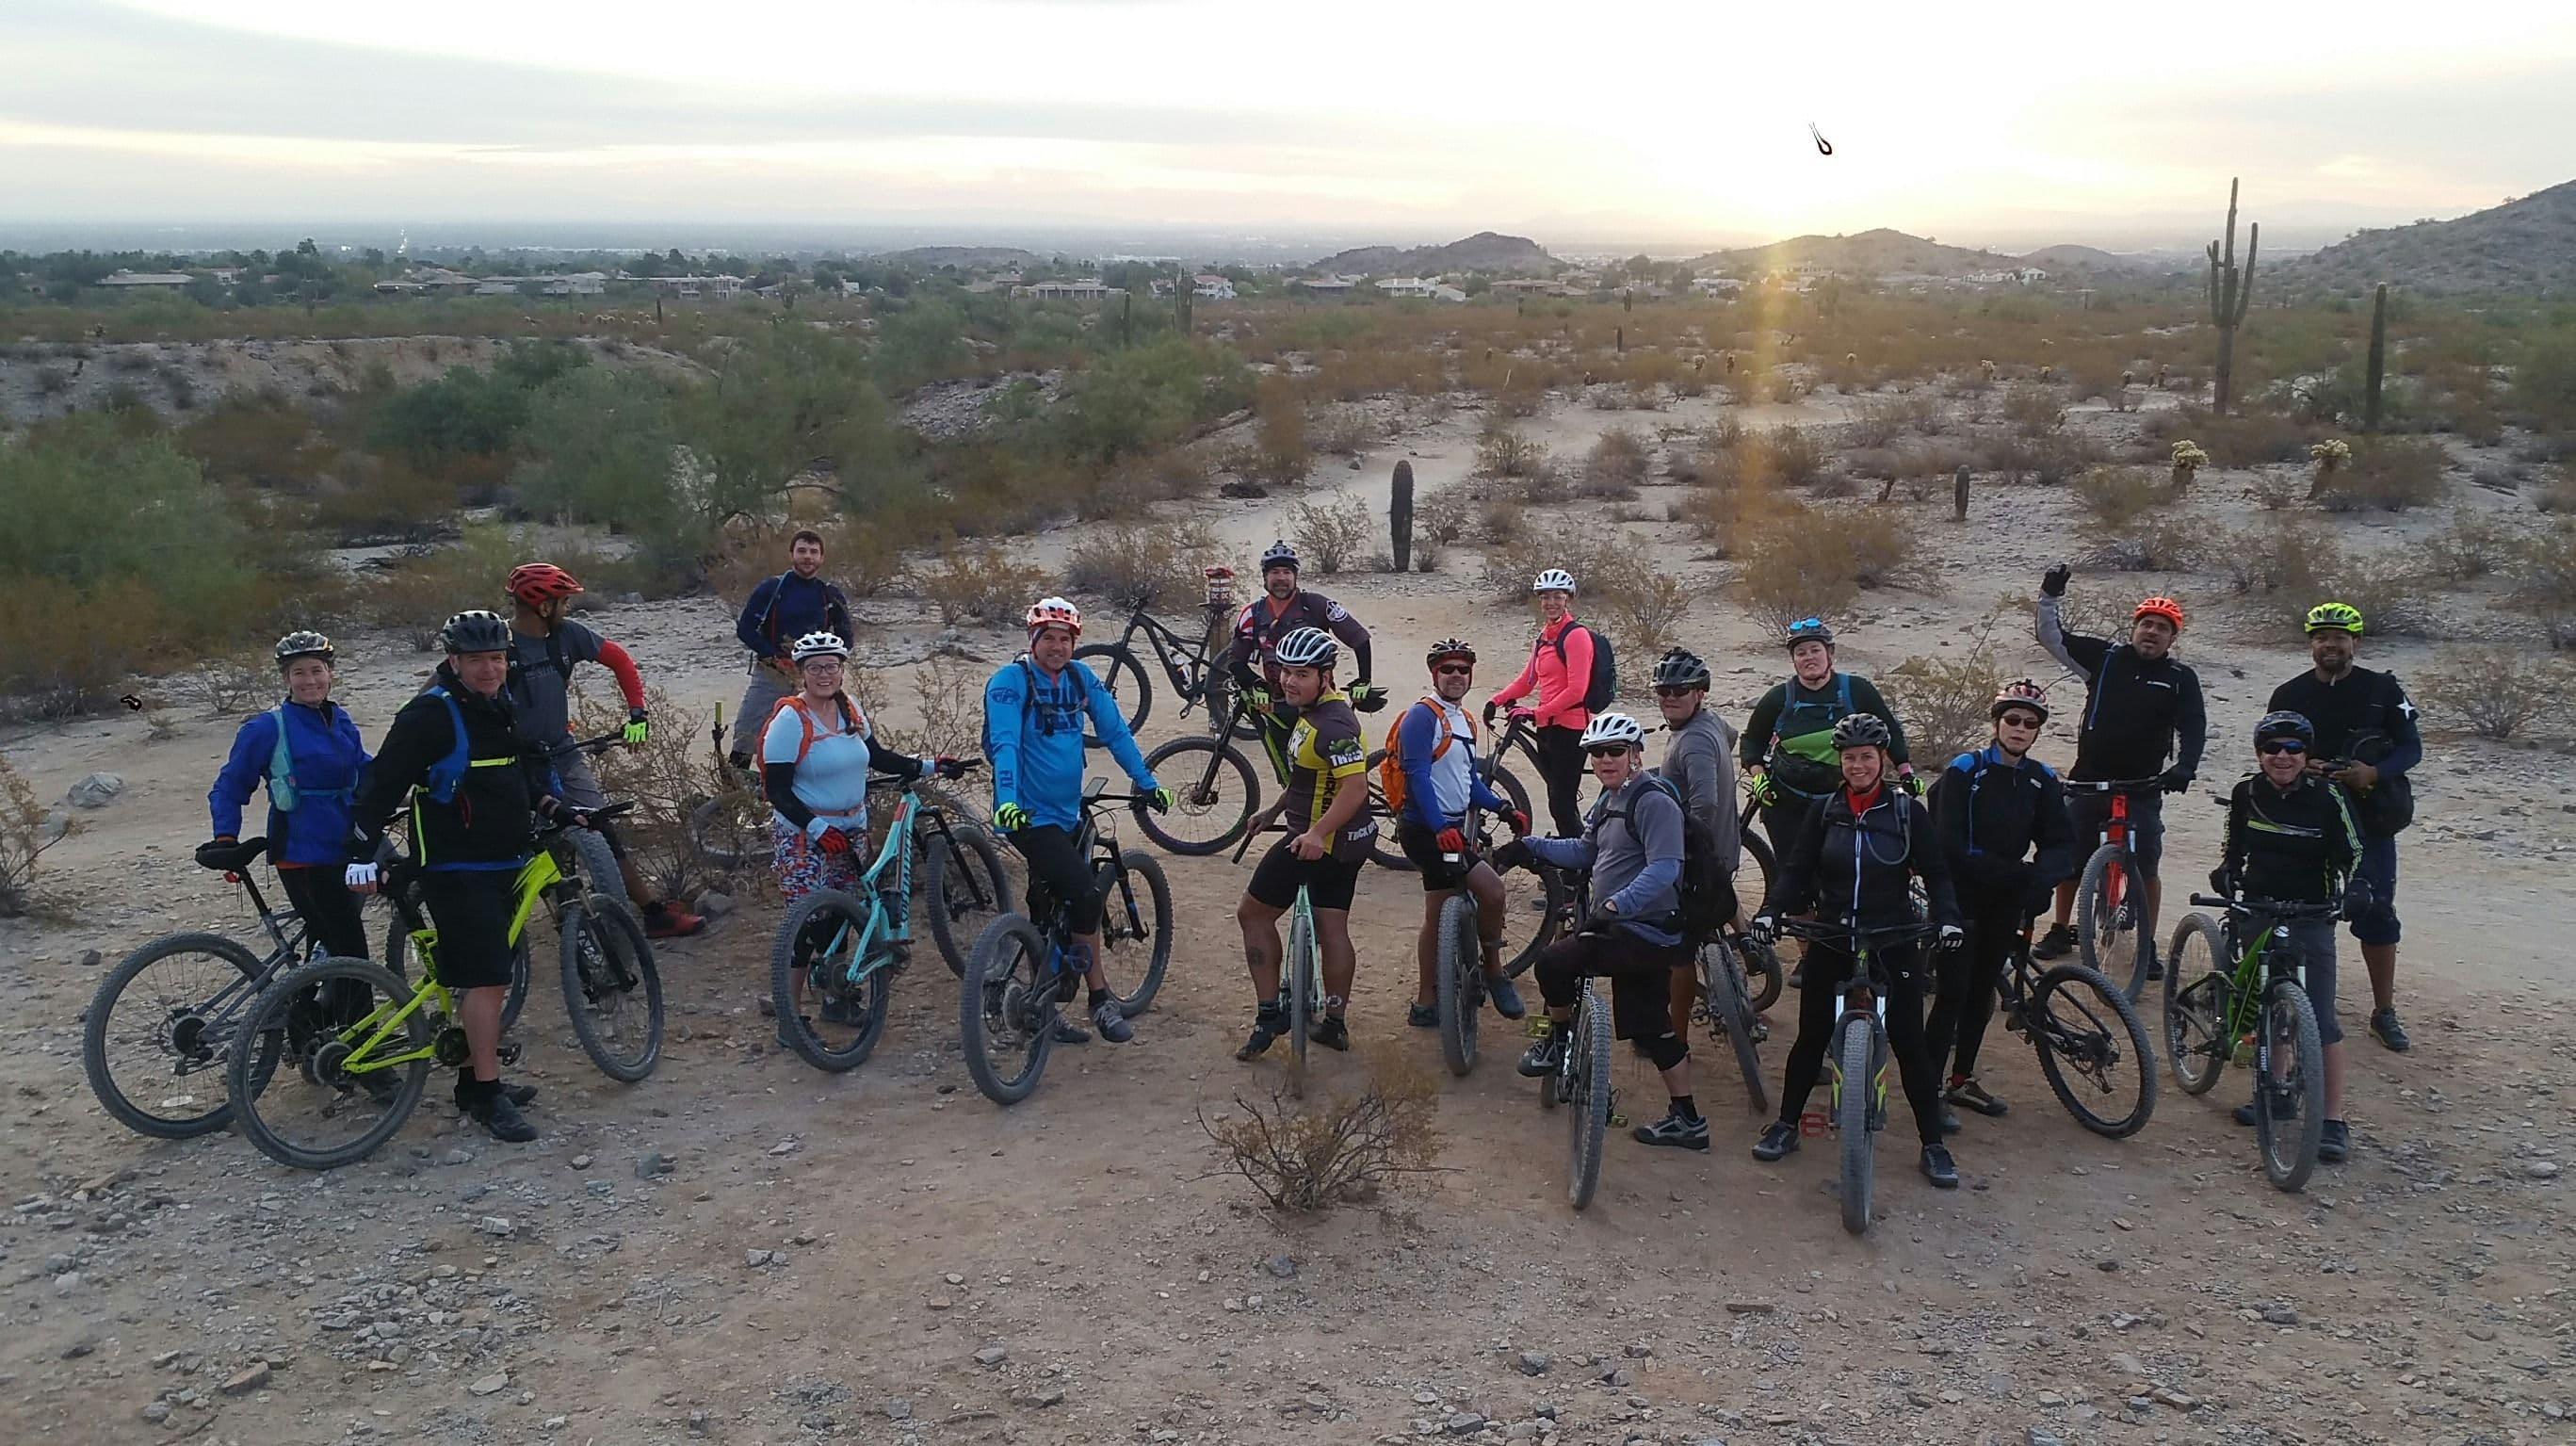 Ride and Clinic Calendar - Arizona's #1 Specialized Dealer